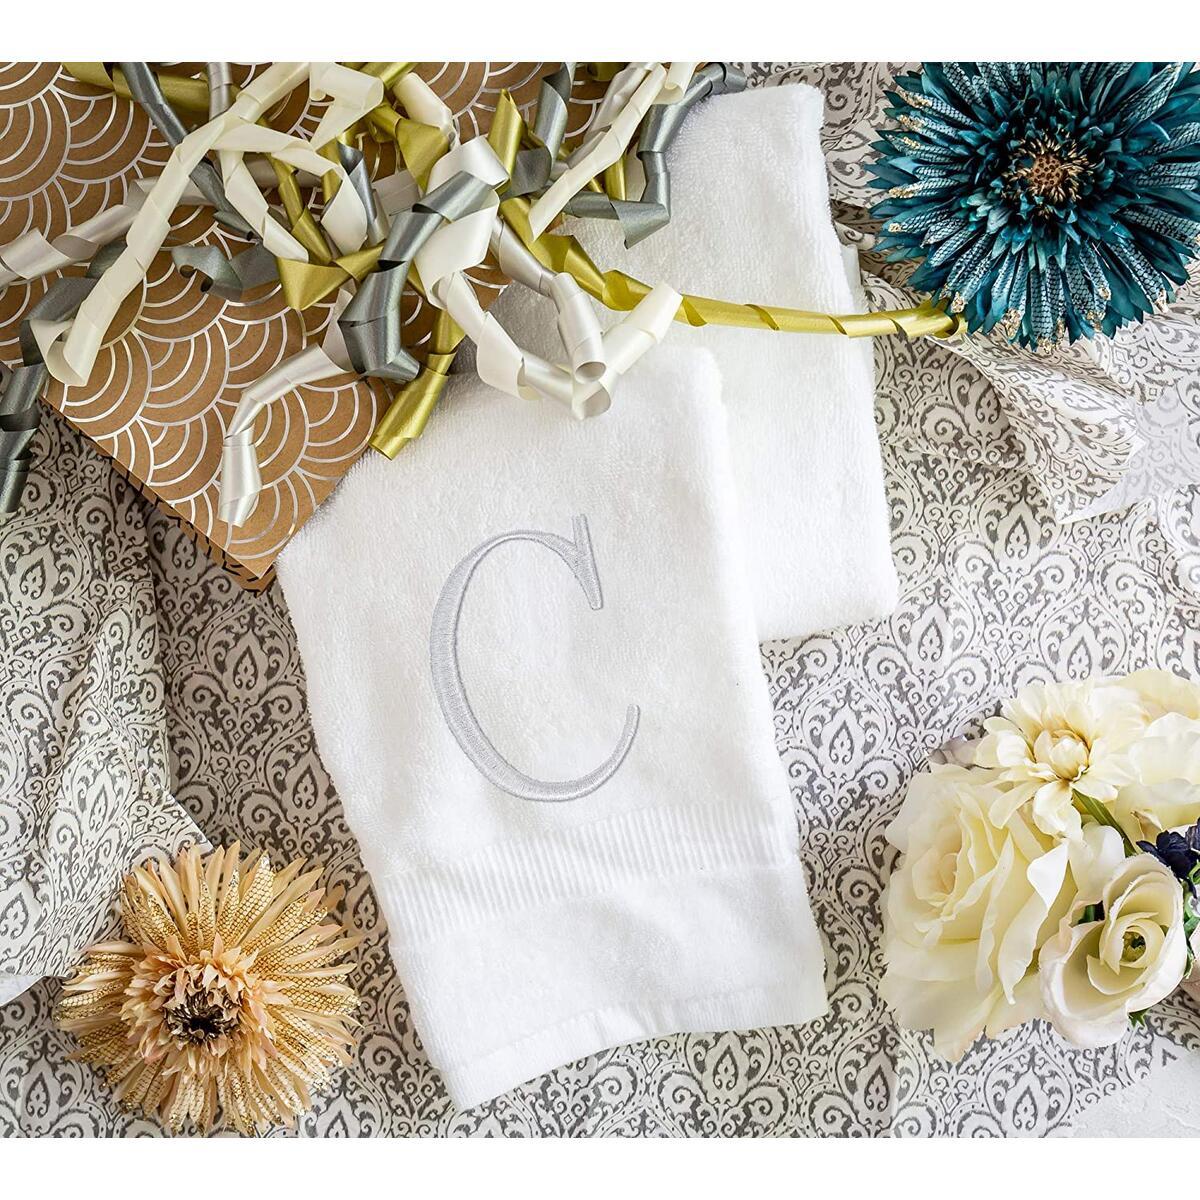 Organic Monogrammed Hand Towel for Bathroom Set of 2 - Letter C